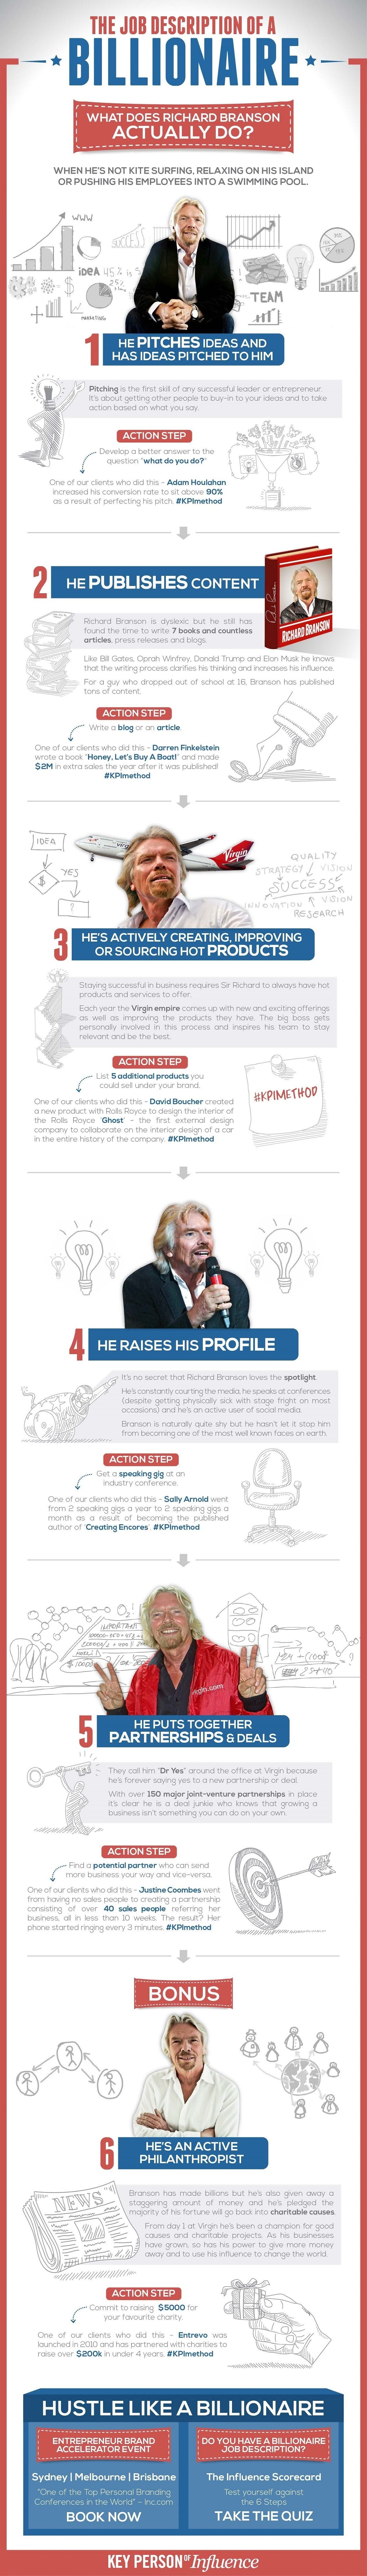 the-job-description-of-sir-richard-branson-infographic